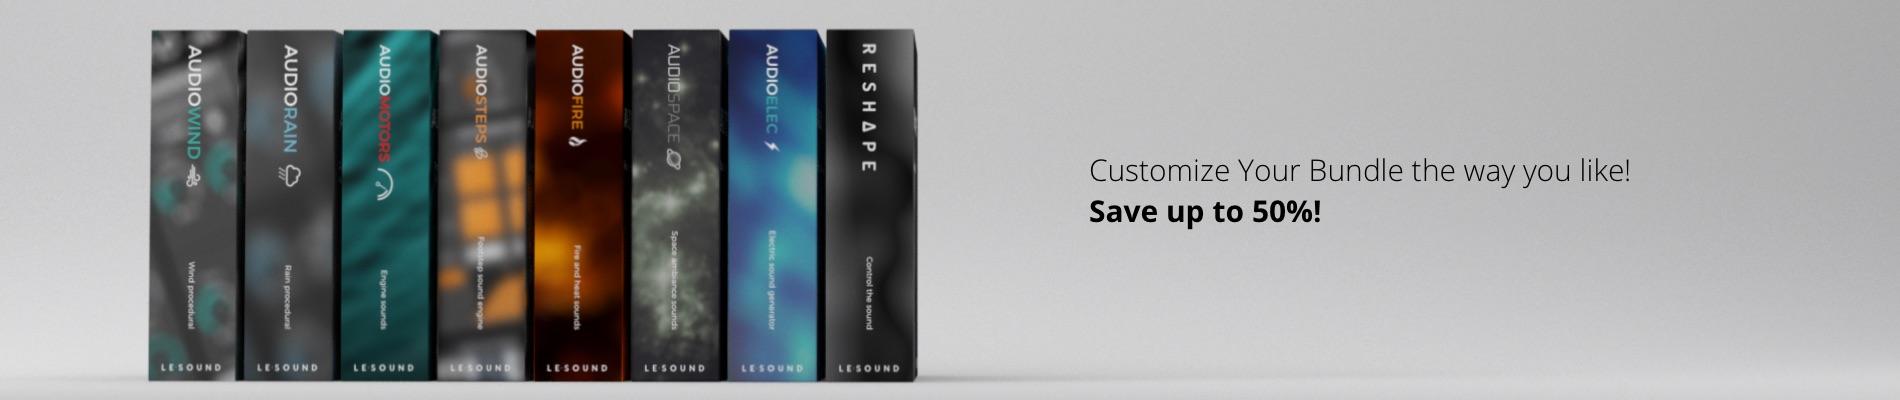 customize your bundle